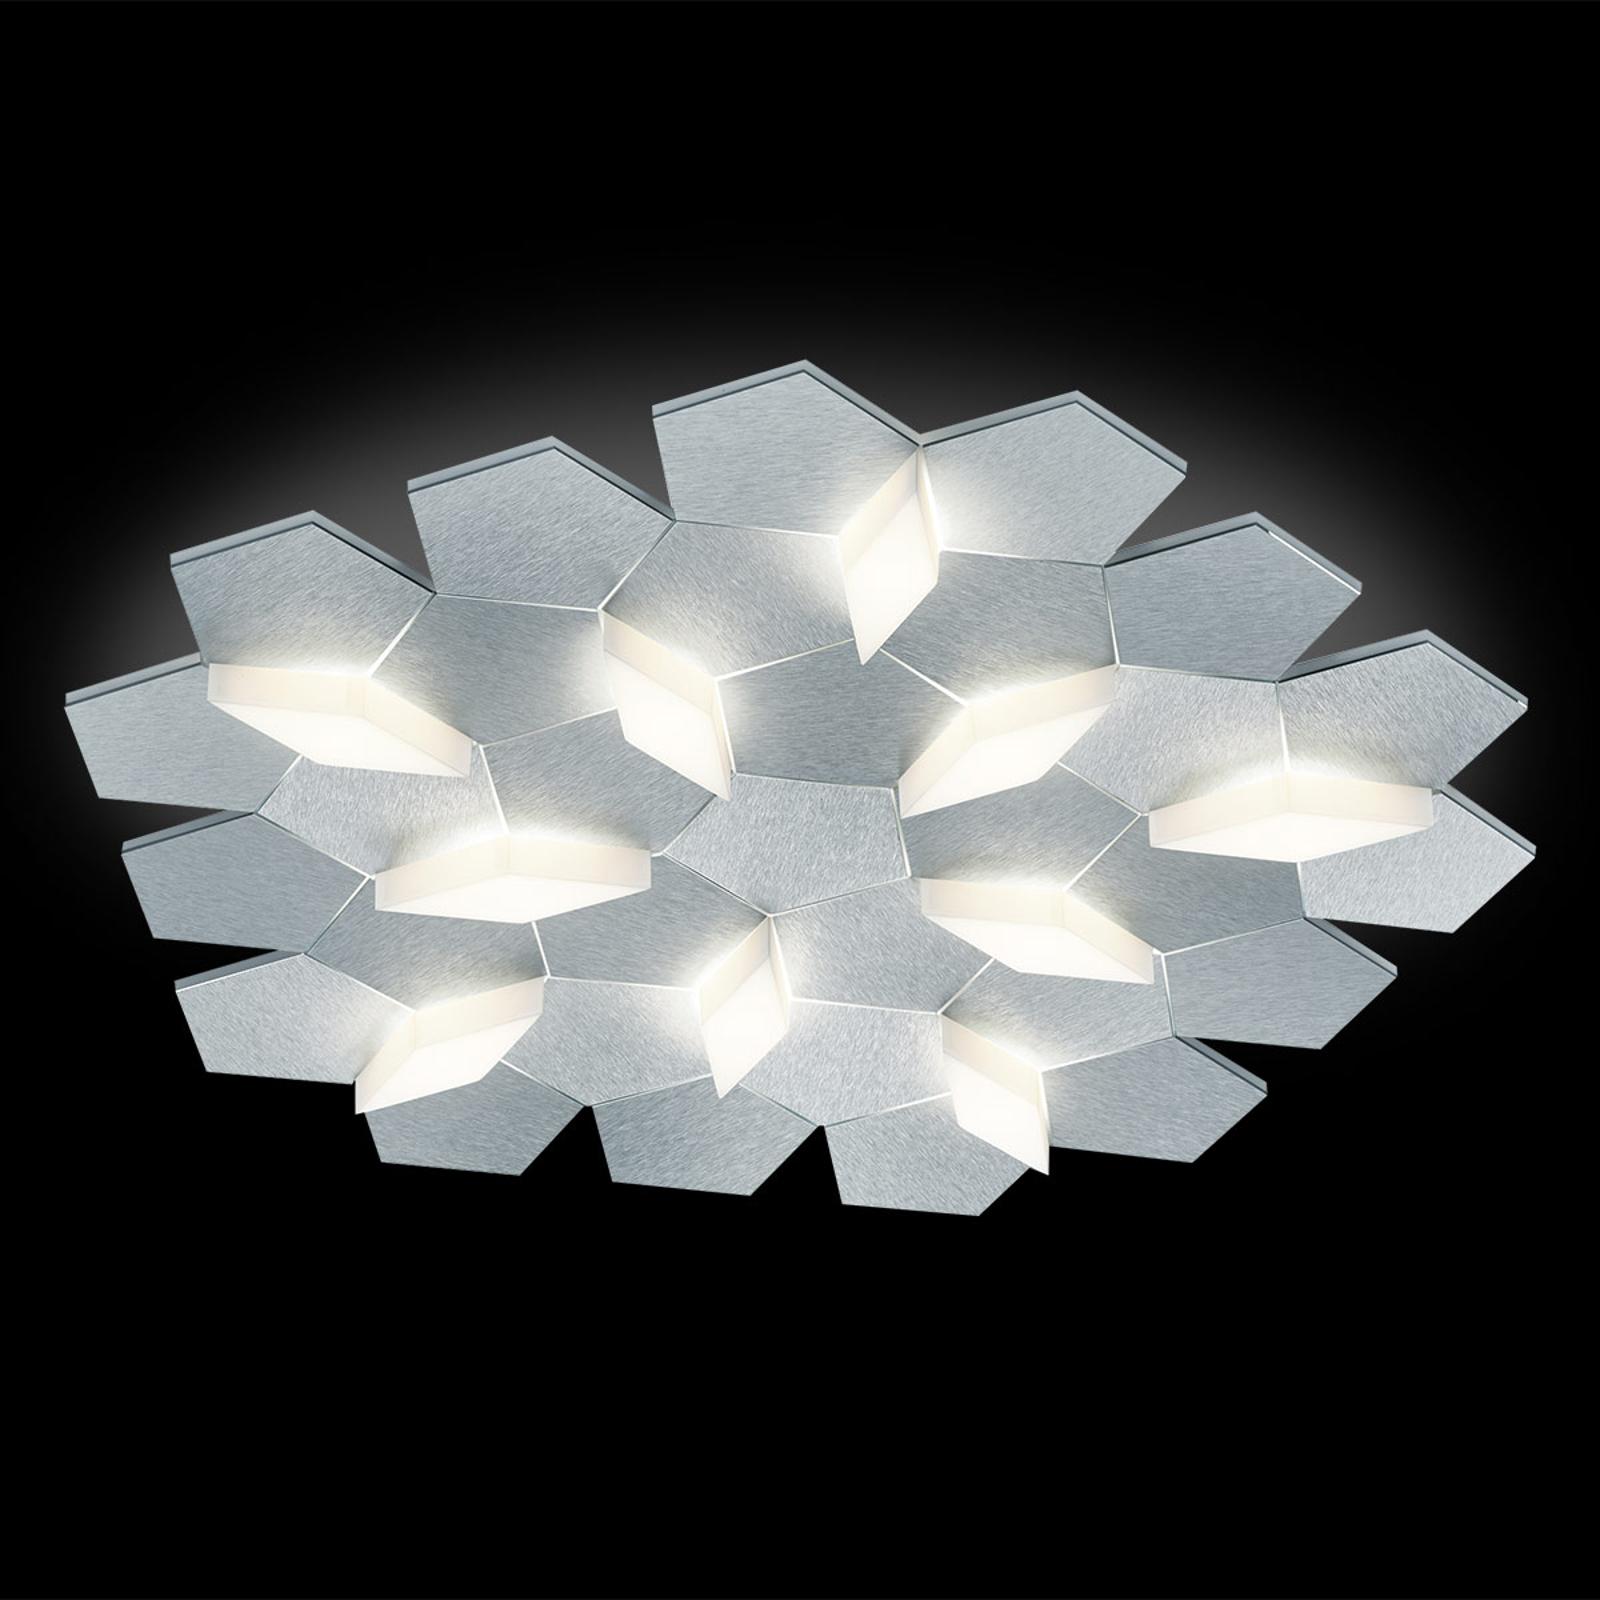 GROSSMANN Karat lampa sufitowa LED 10-punktowa